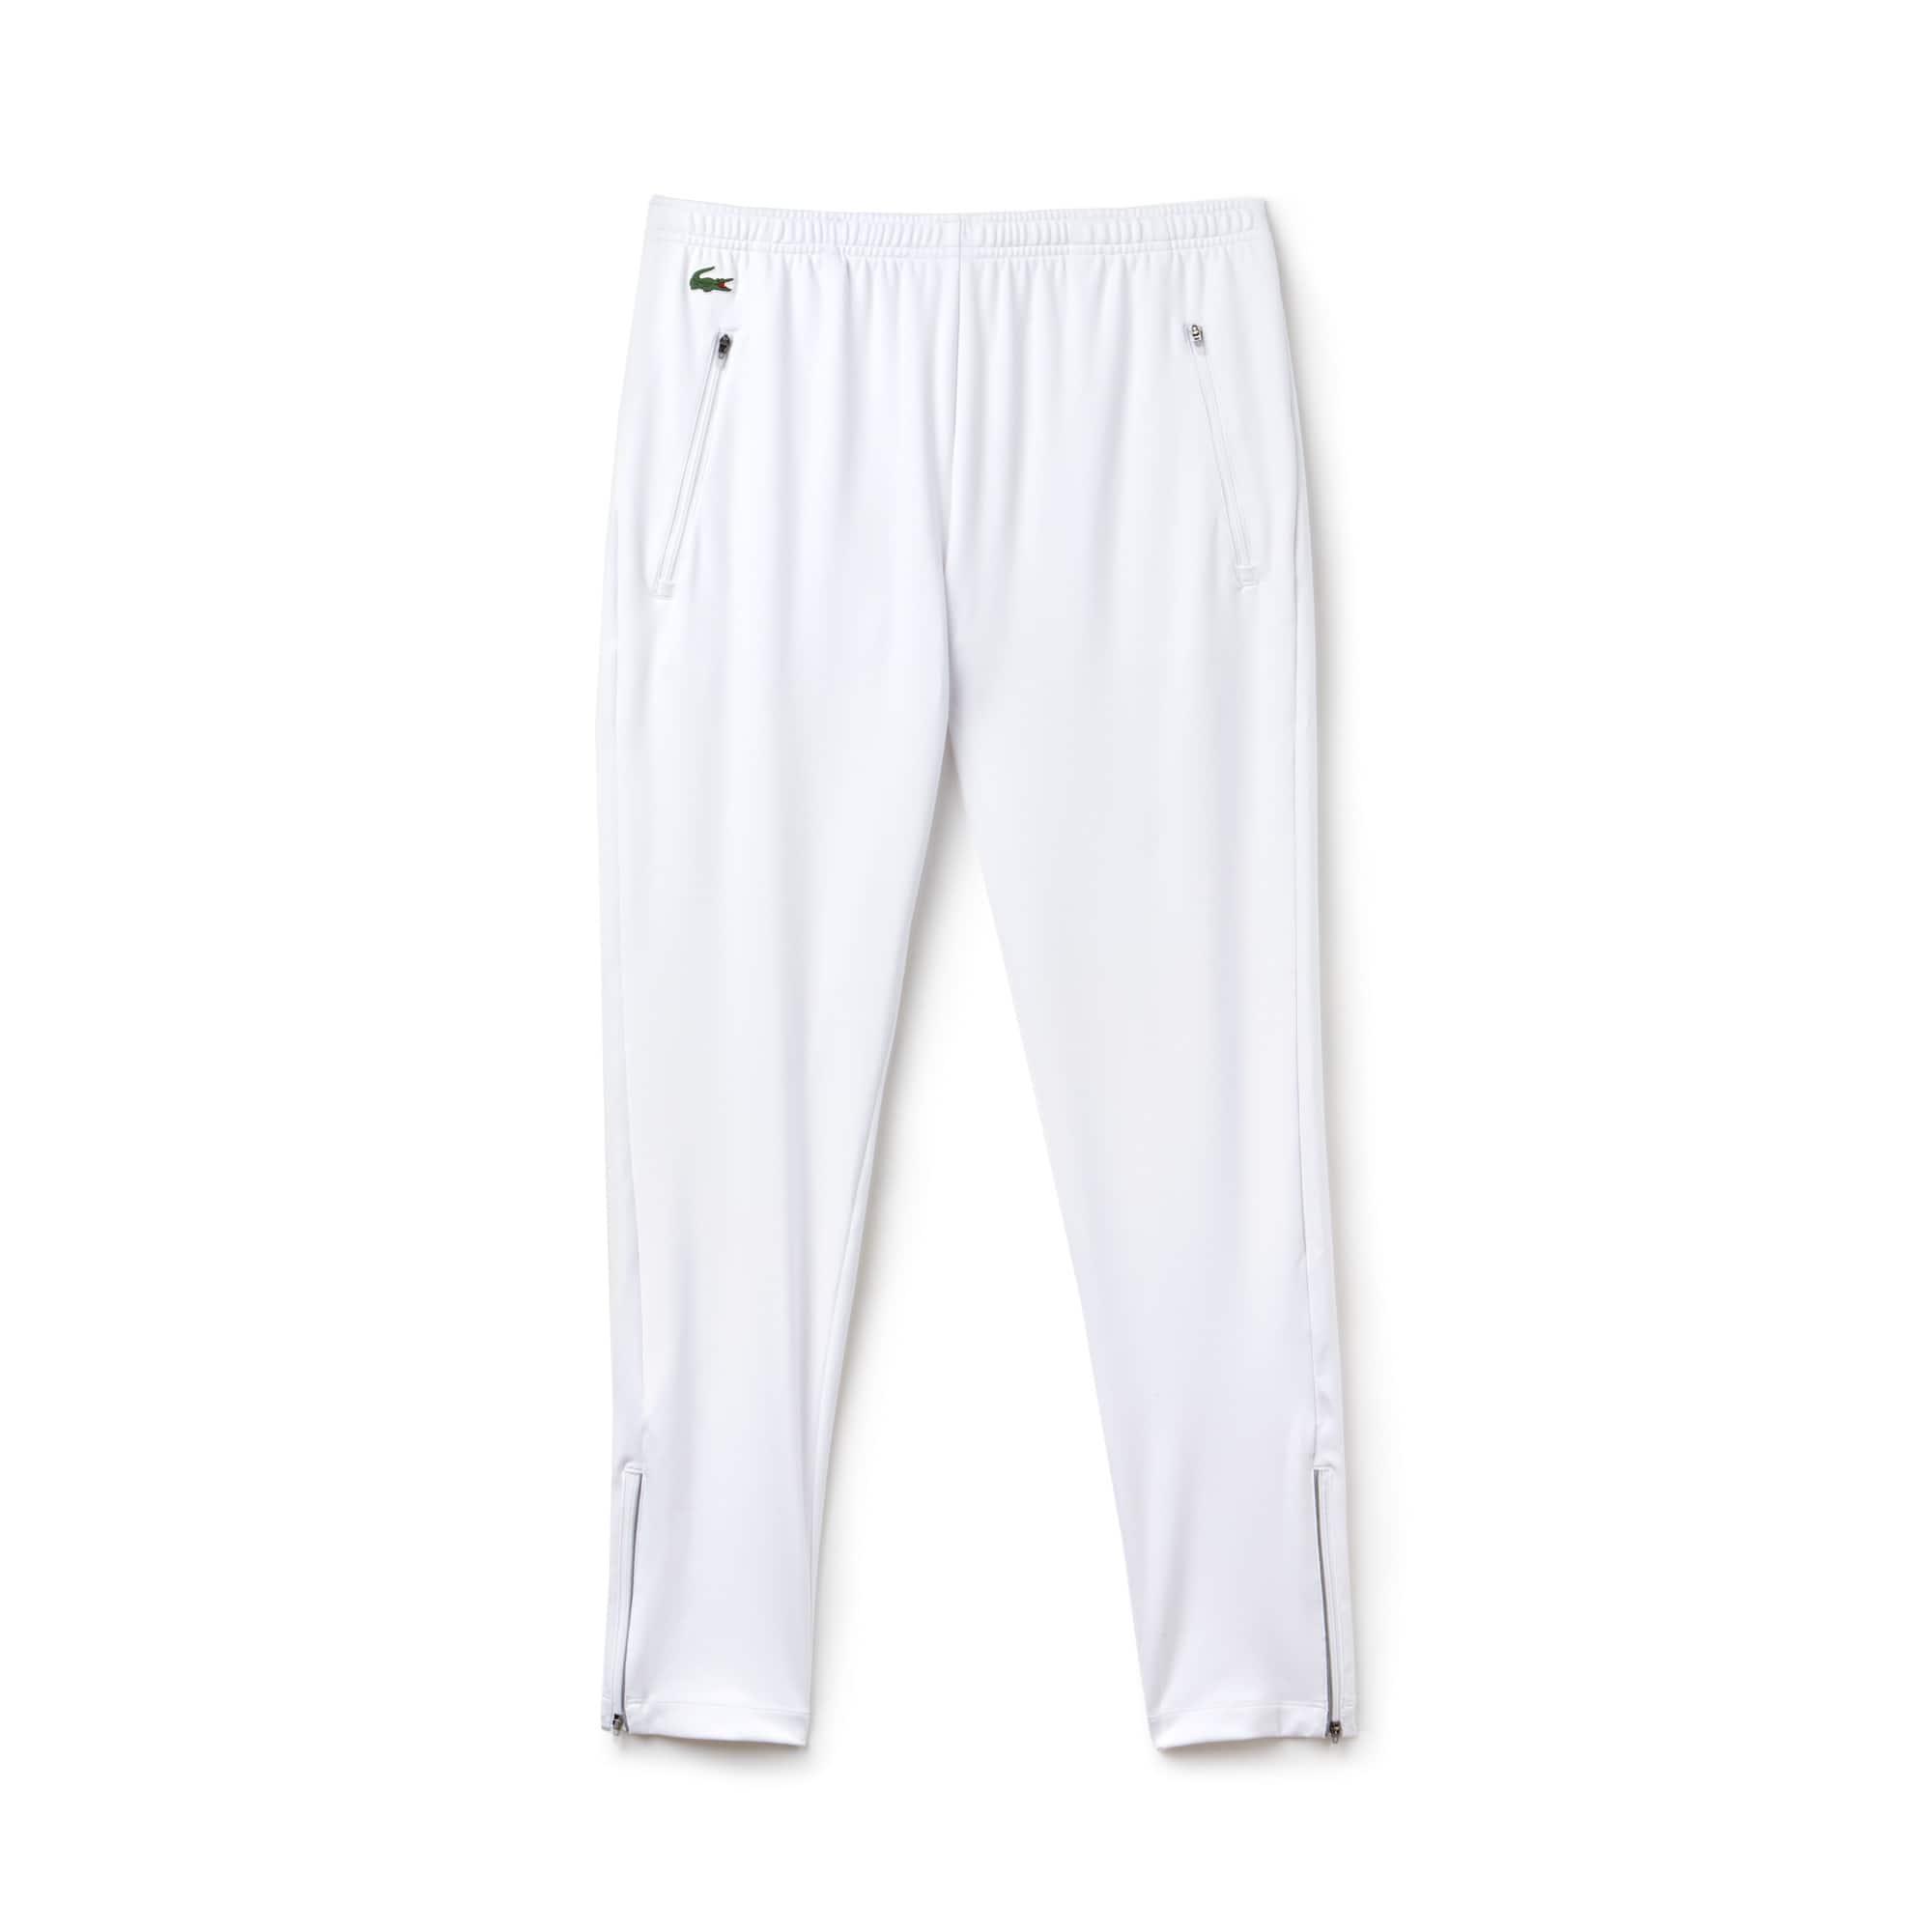 Men's SPORT Technical Stretch Jersey Trackpants - Novak Djokovic Supporter Collection